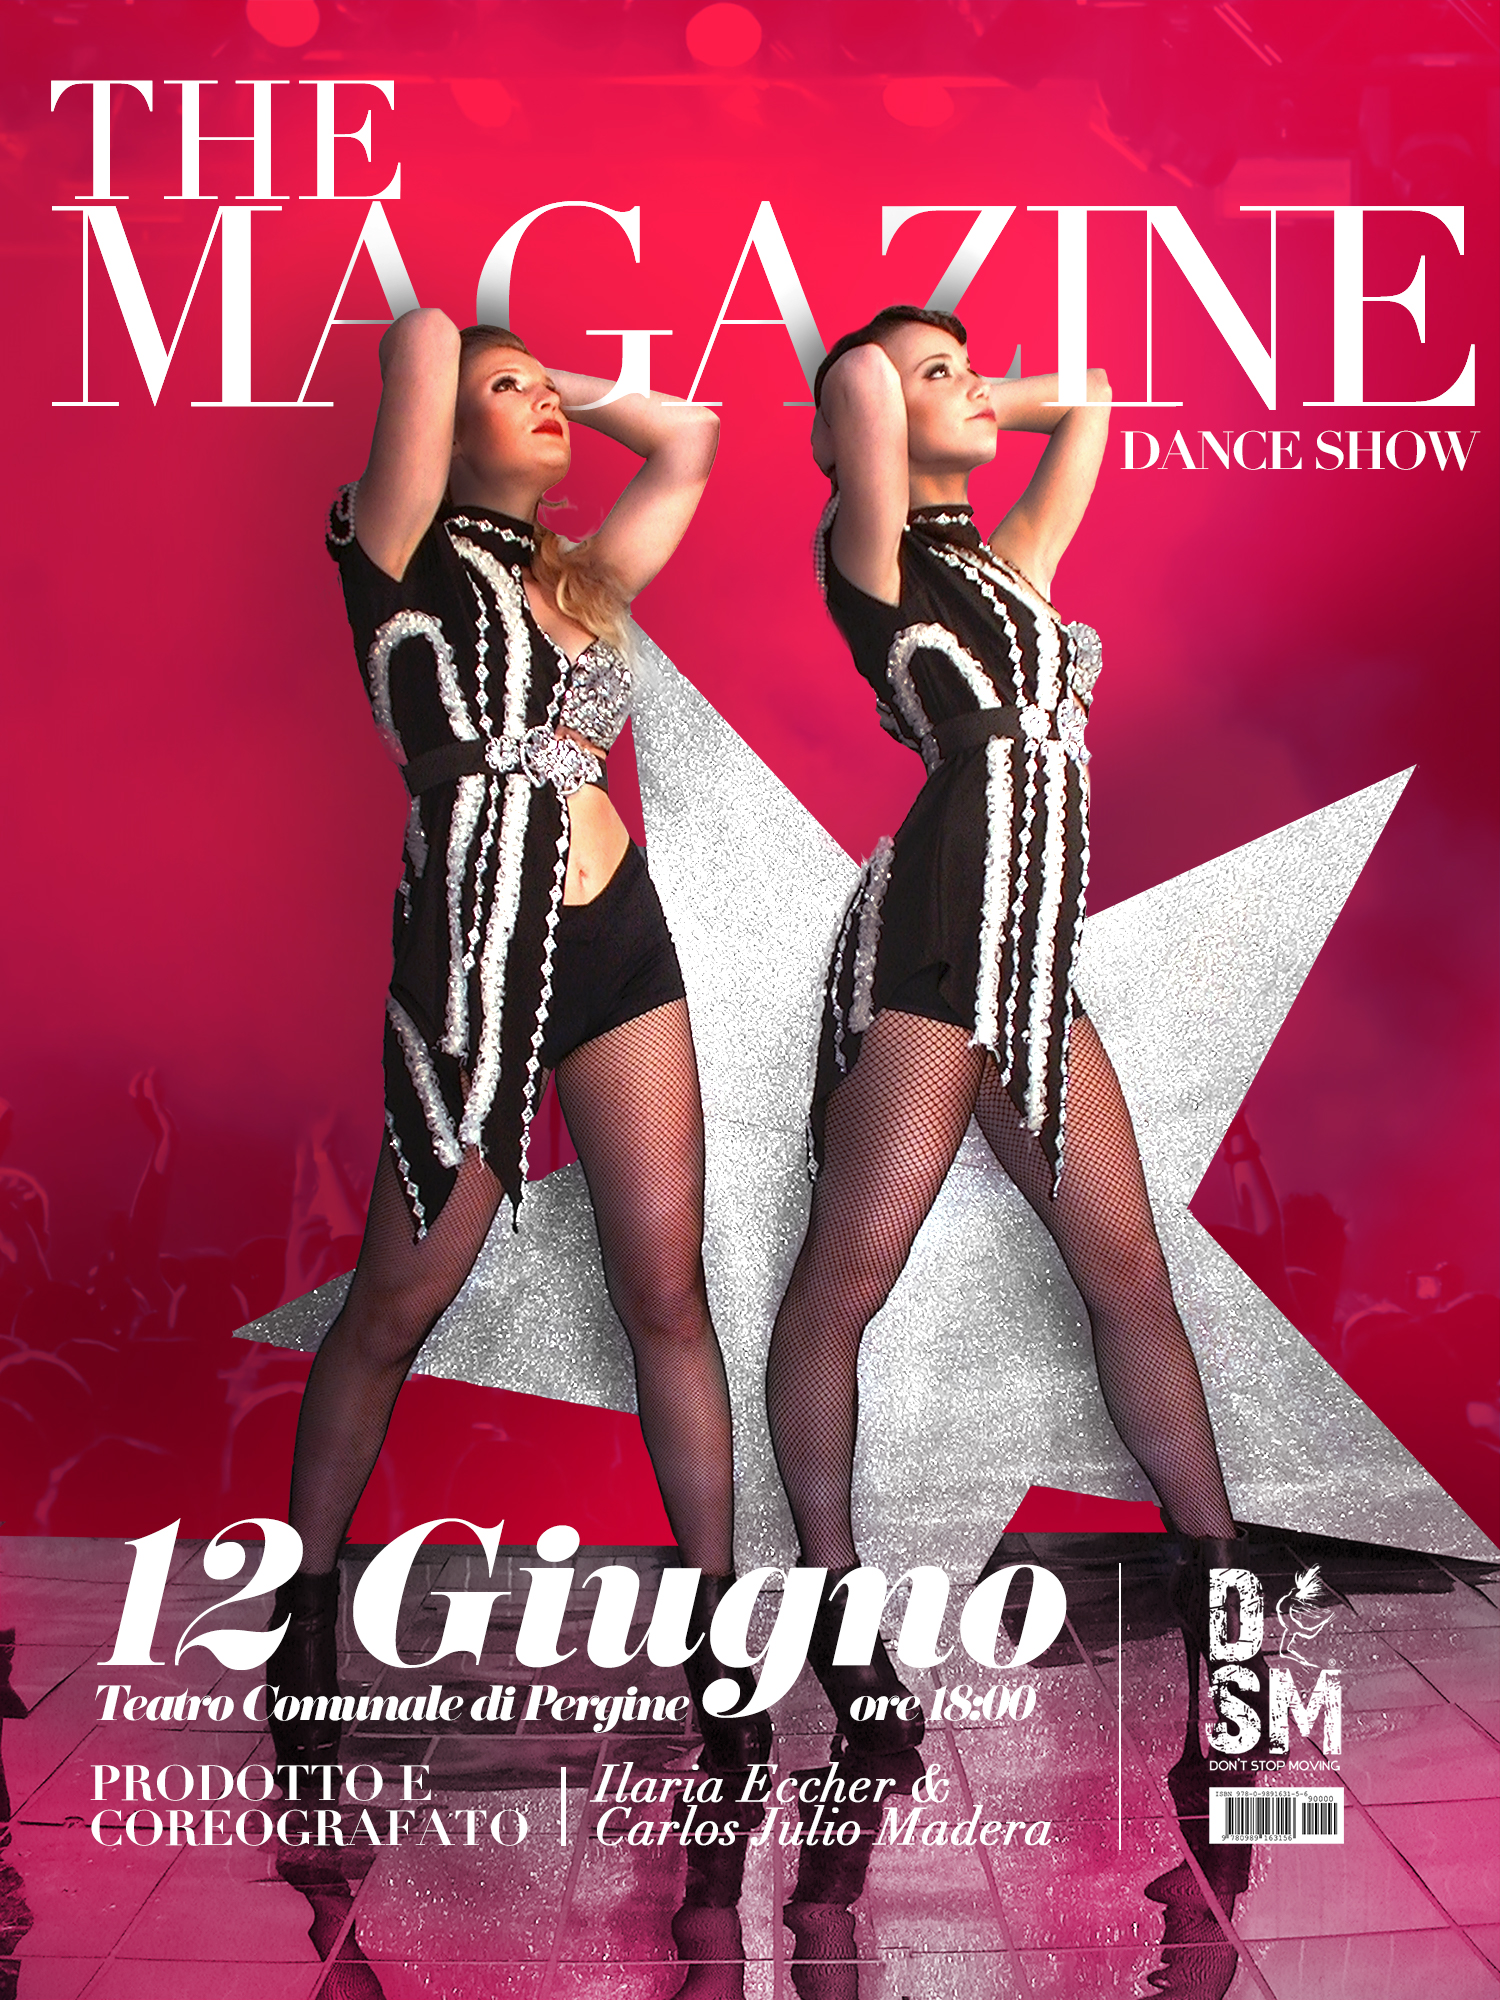 TheMagazine poster.jpg